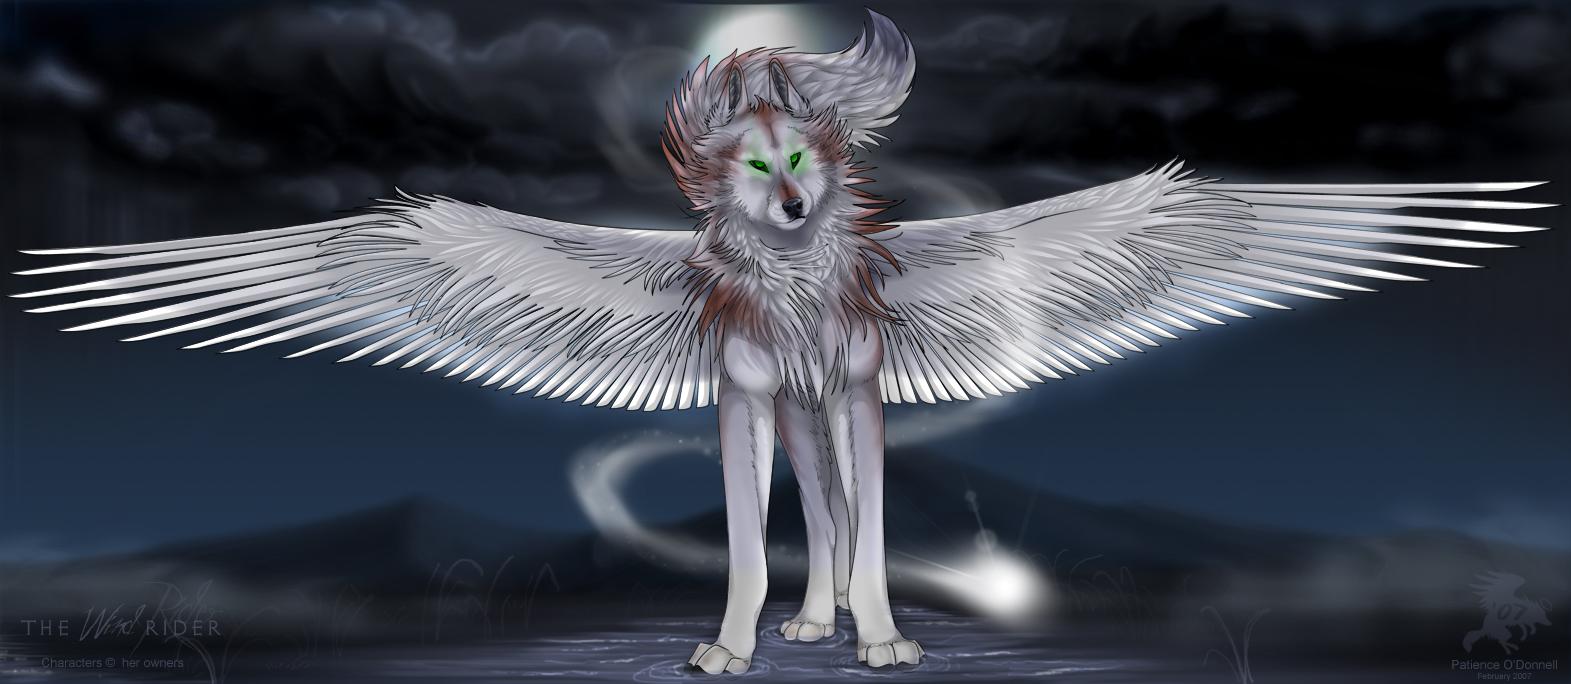 The Wind Rider By Shadowwolf